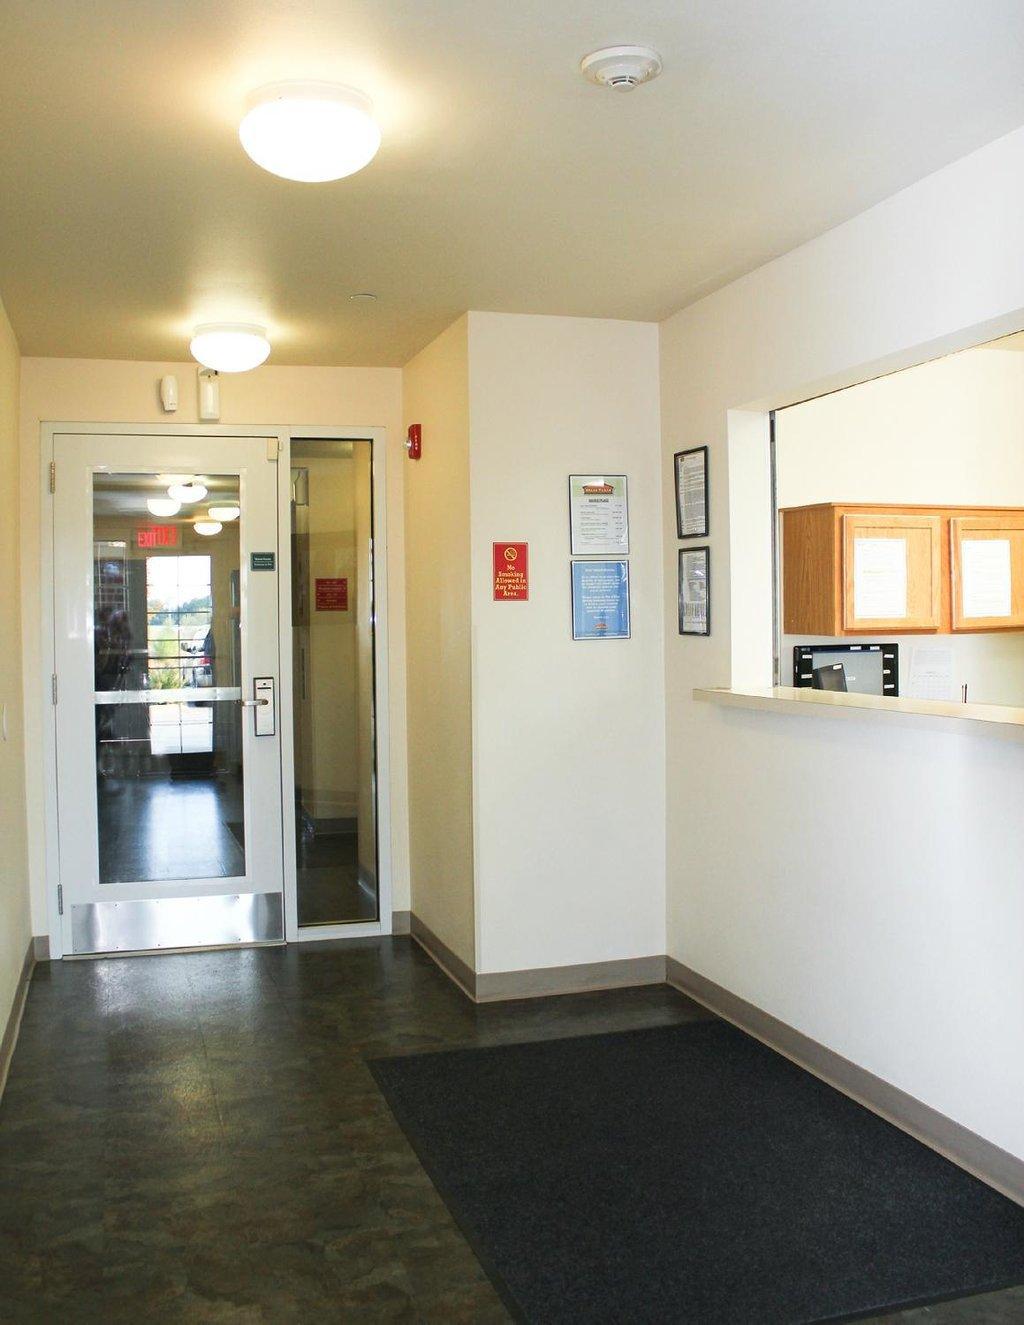 WoodSpring Suites Des Moines Pleasant Hill IA Jobs